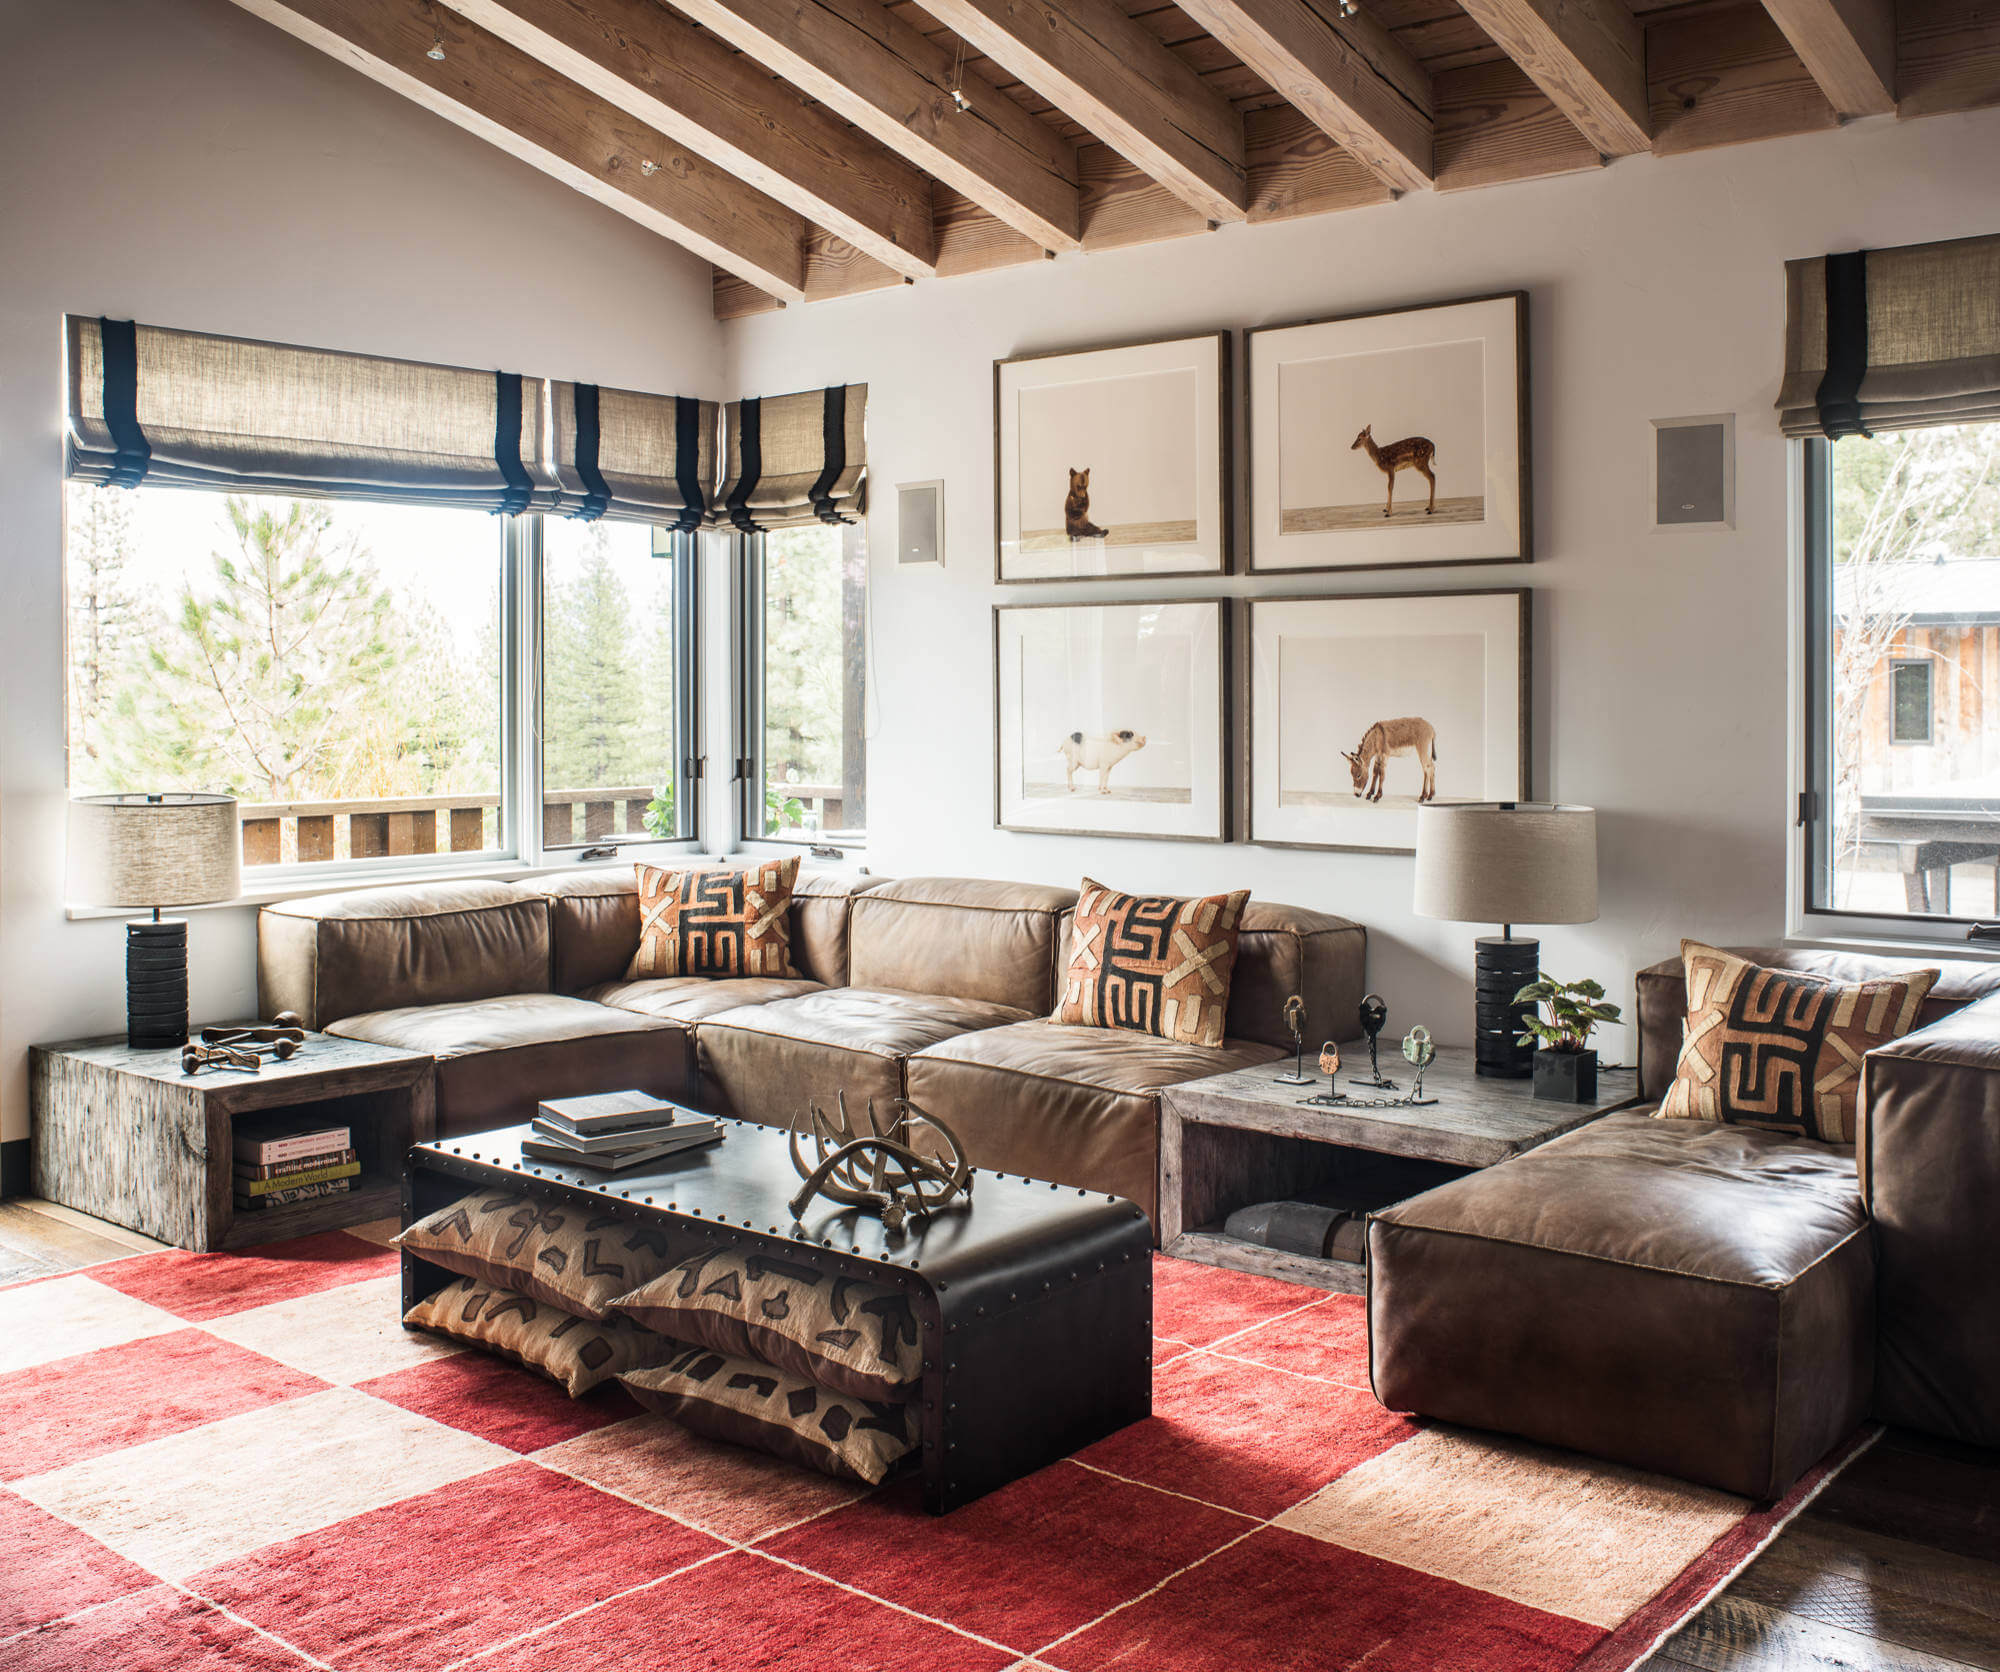 truckee-retreat-antonio-martins-interior-design-03